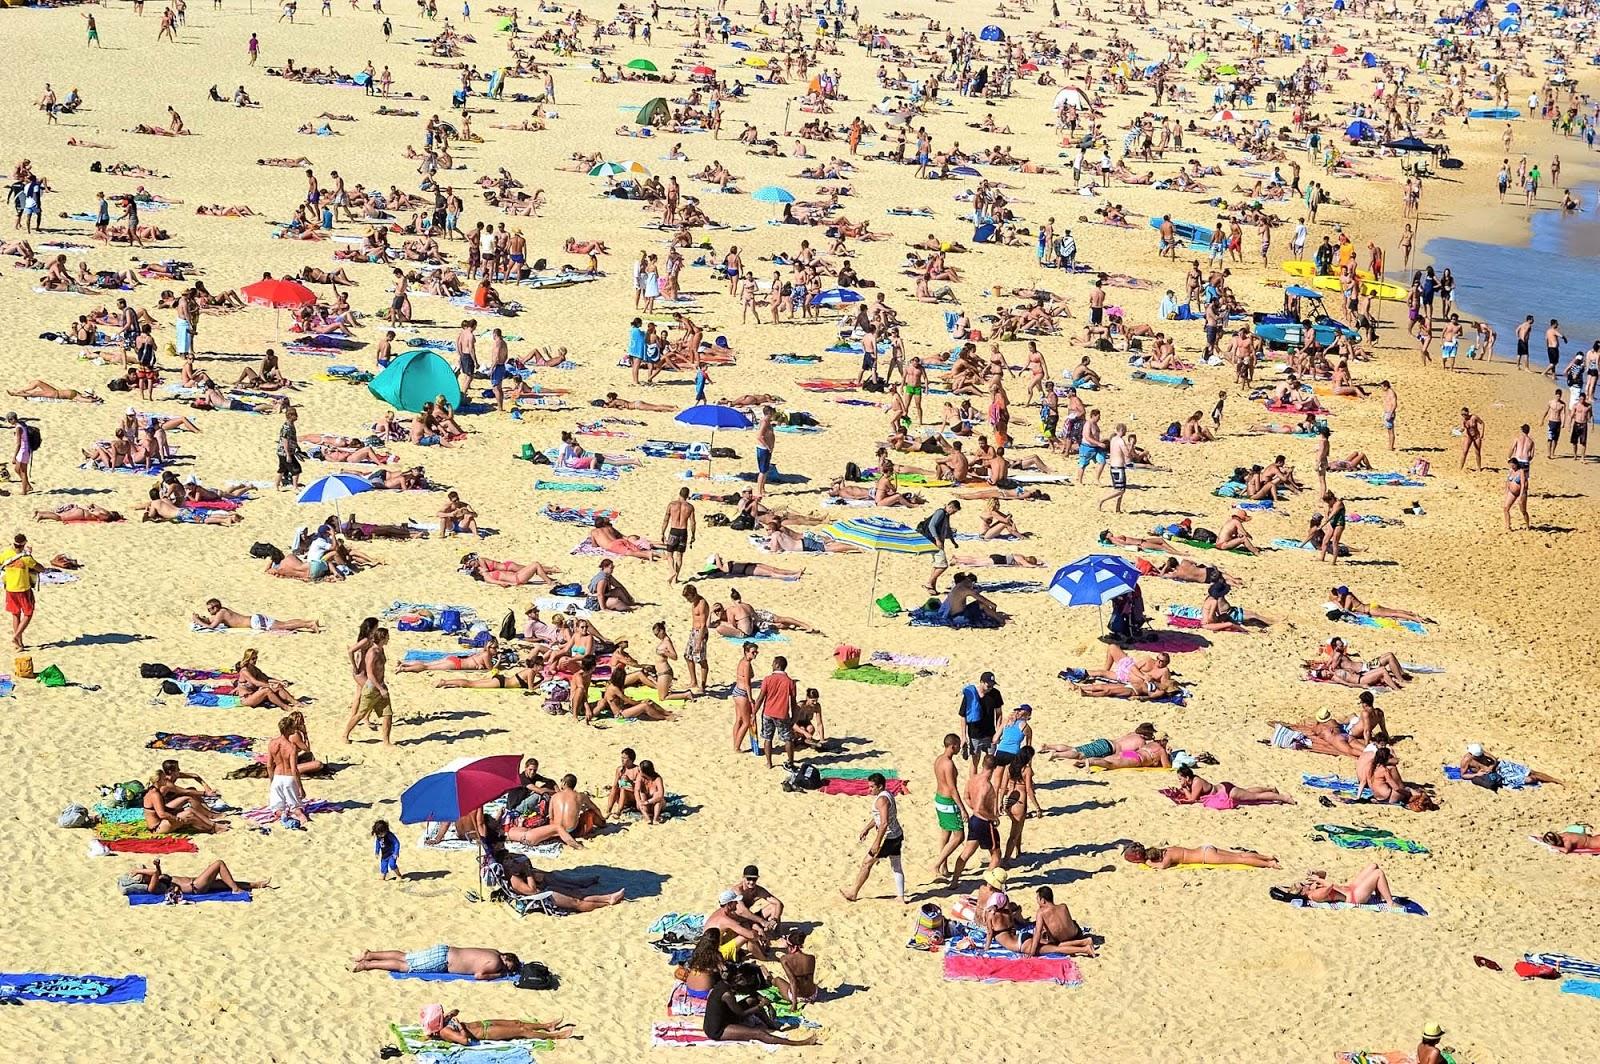 bondi beach at summer time